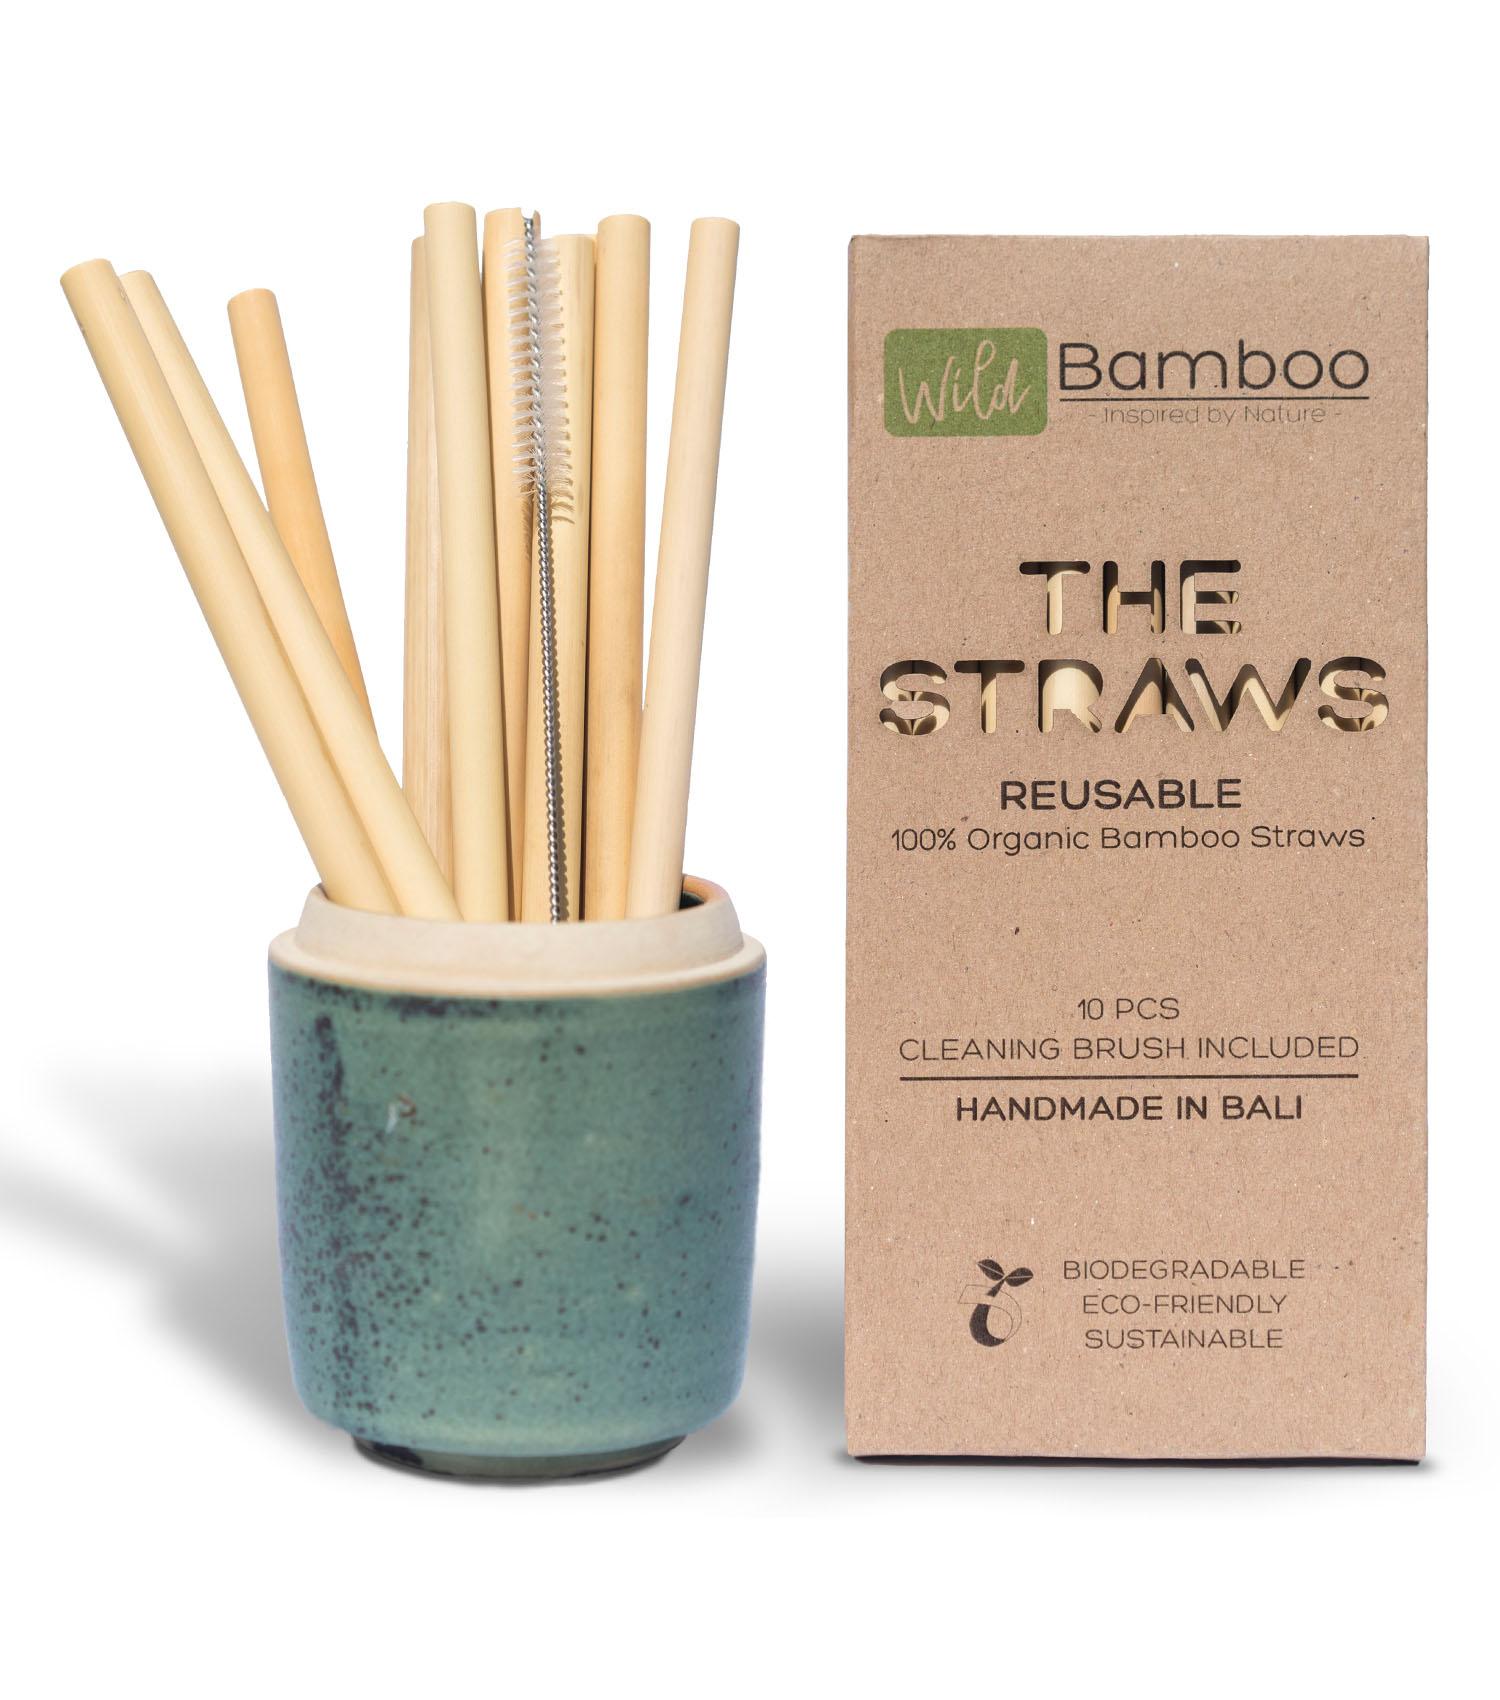 Wild Bamboo Bambusstrohhalme